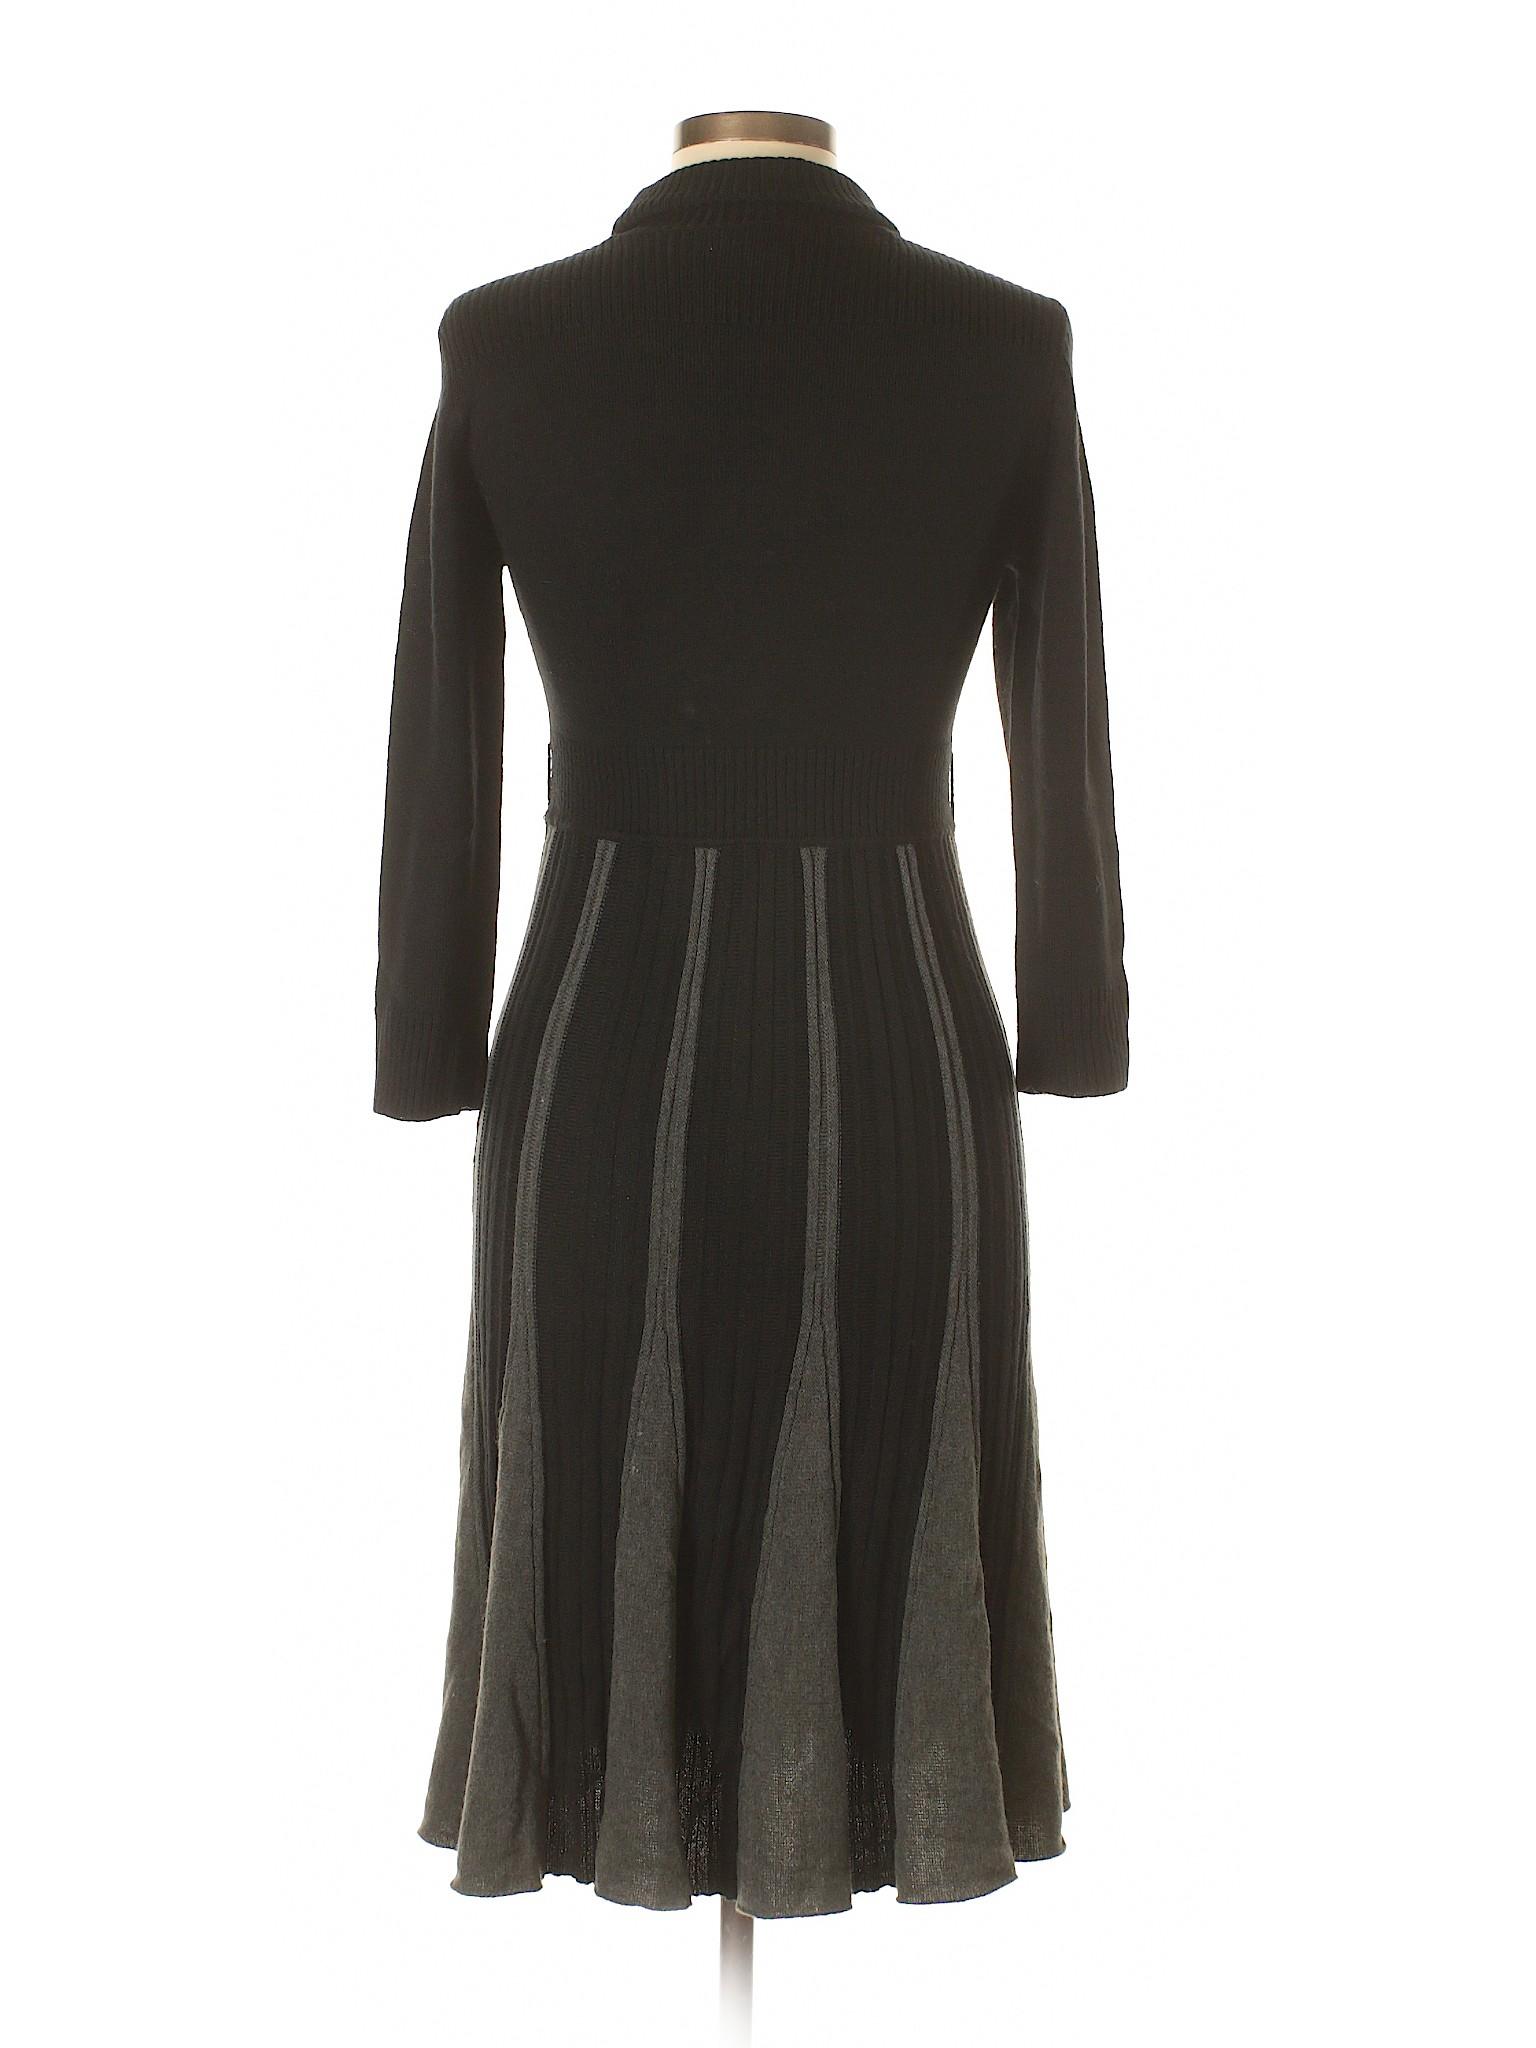 Casual London Times Dress Boutique winter w8qATOxp